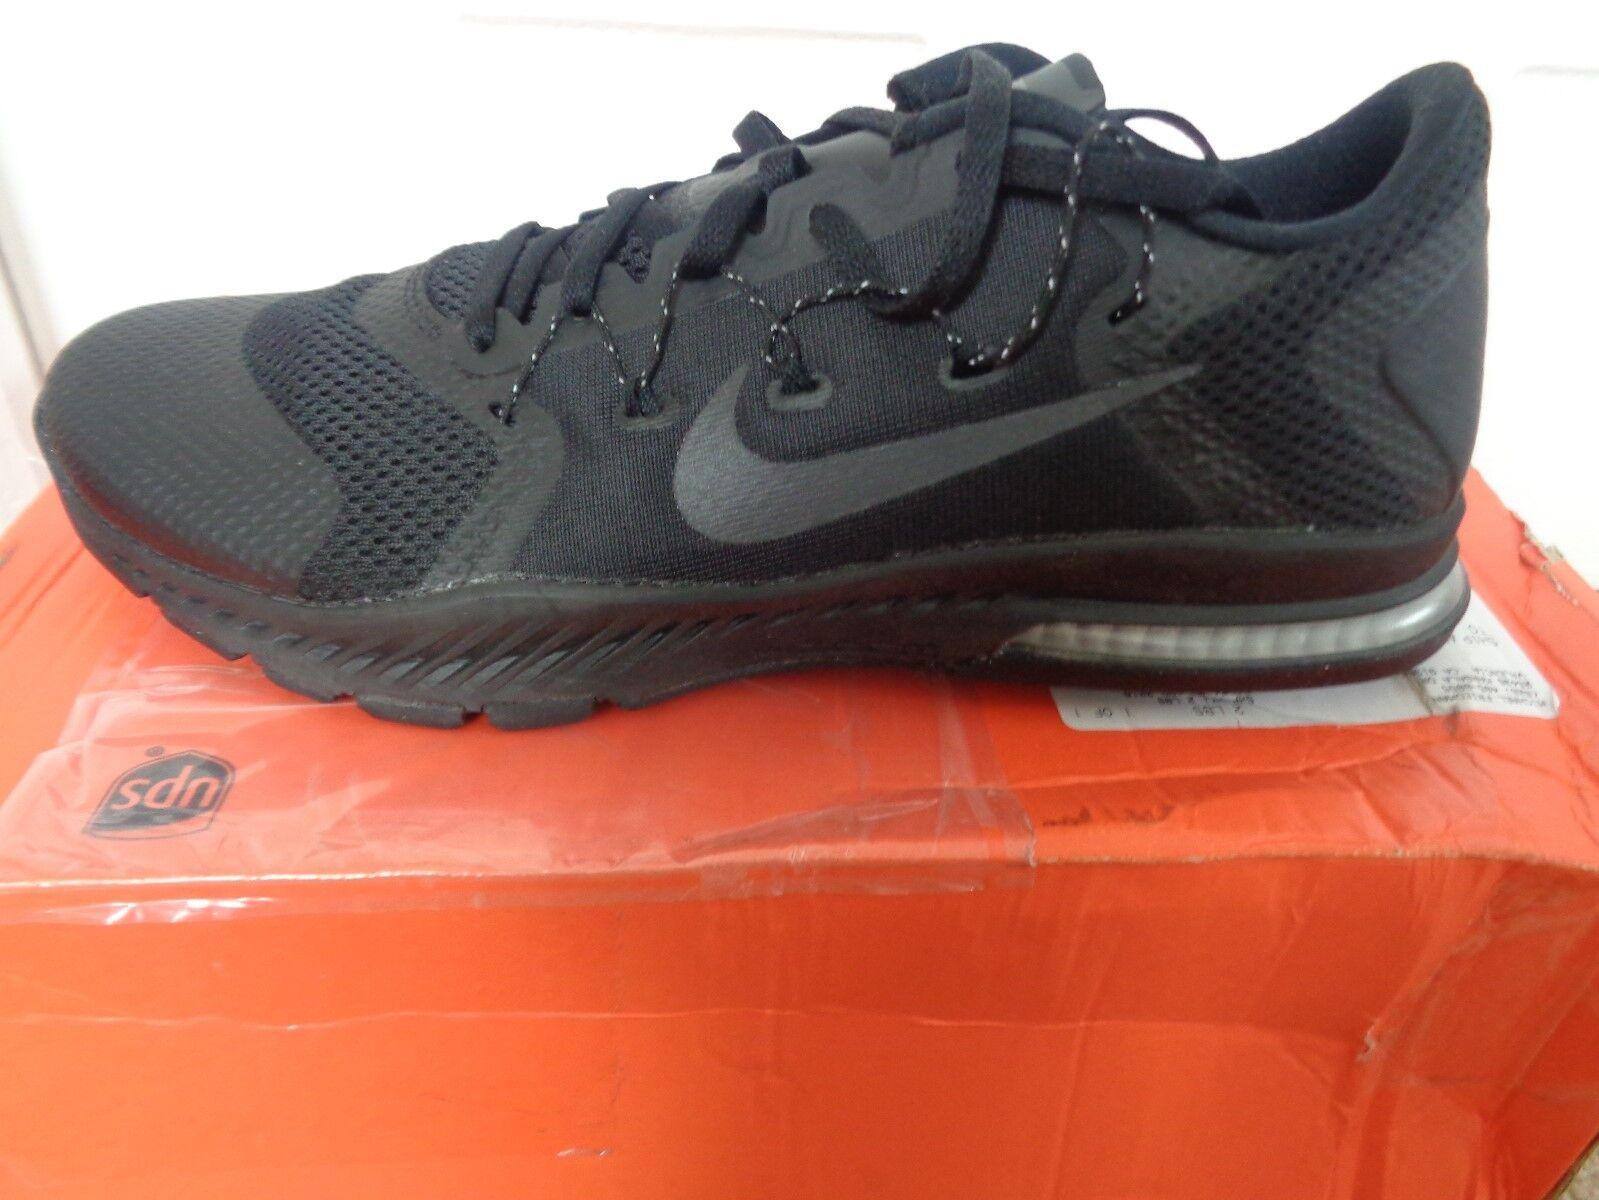 Nike  Zoom Train Complete trainers shoes 882119 003 uk 8 eu 42.5 us 9 NEW+BOX